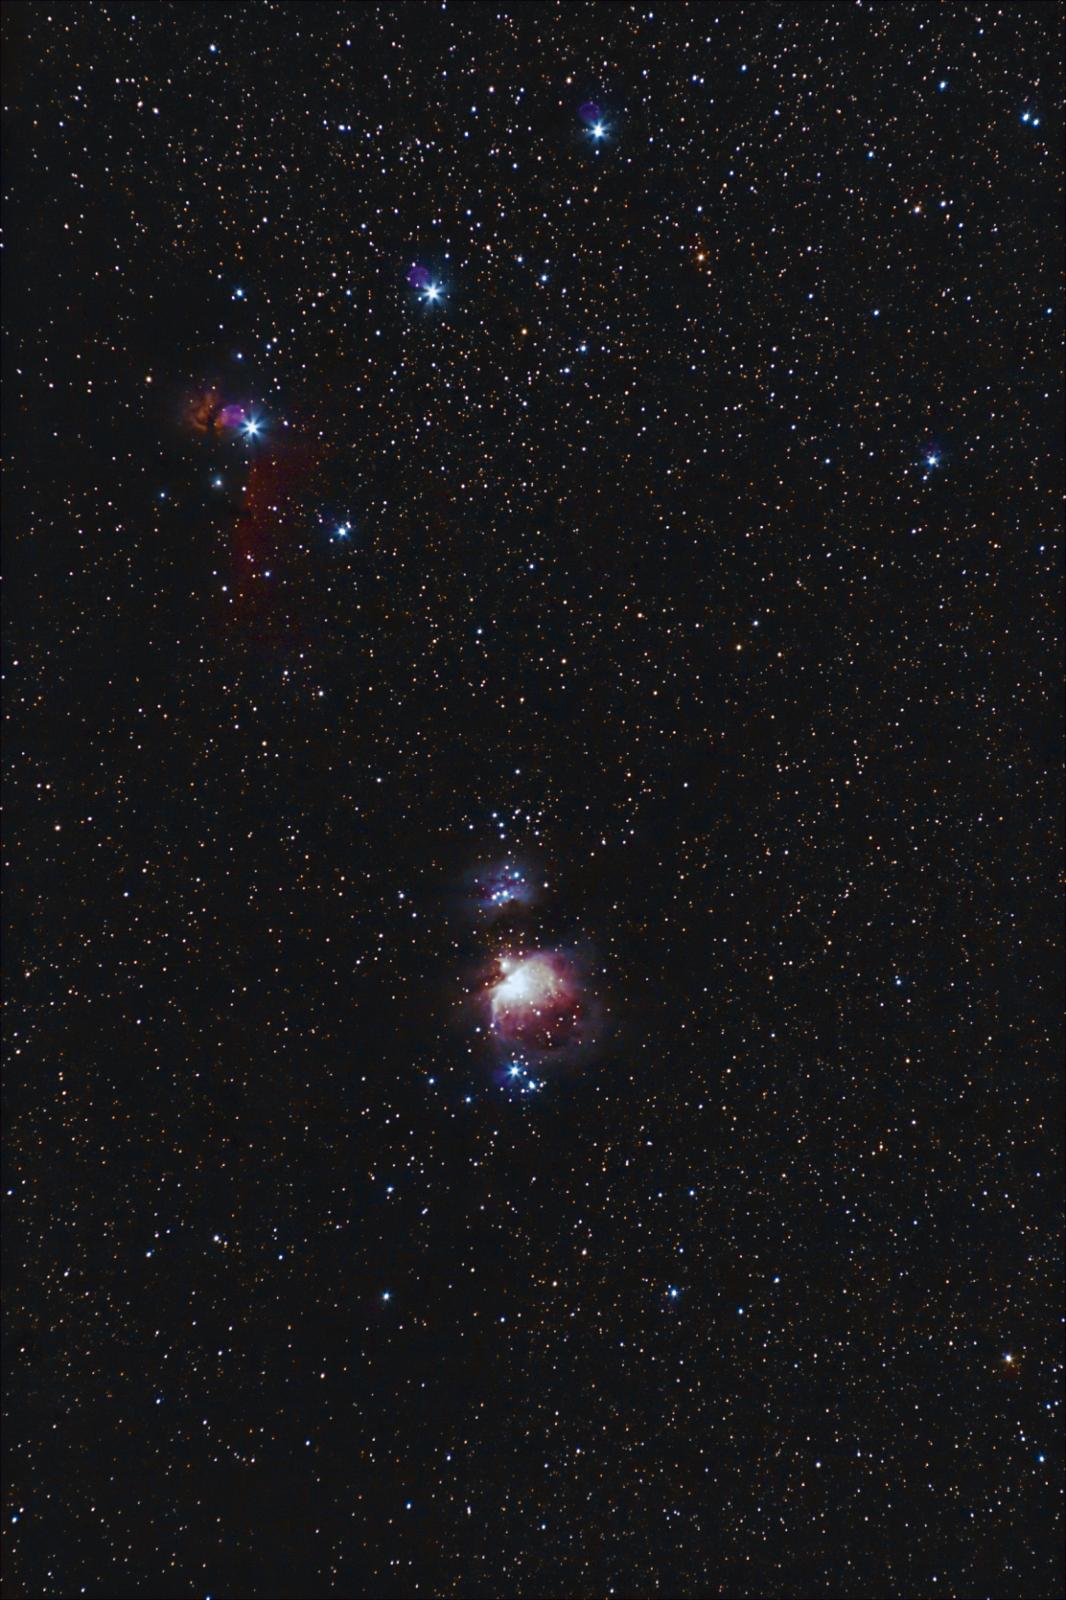 Orion2.thumb.png.1119ba9a7445d572f4b46e0e898adffc.png